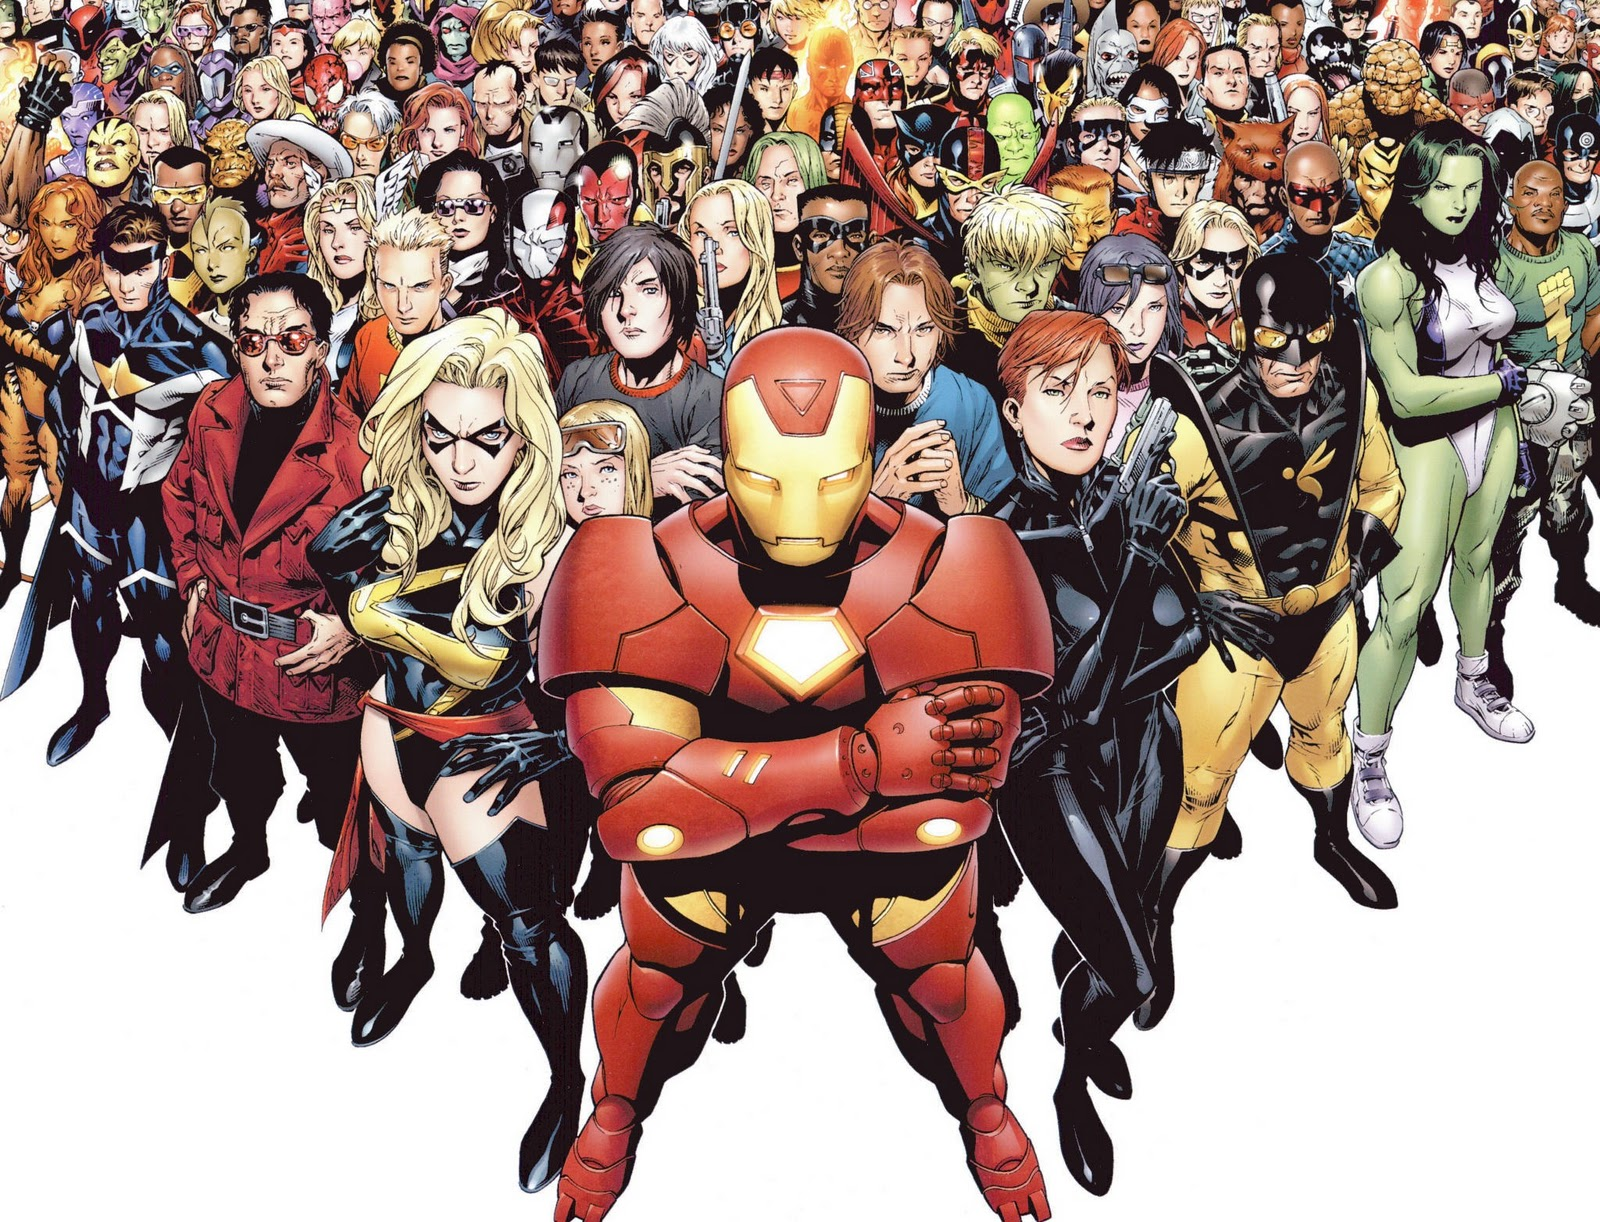 http://1.bp.blogspot.com/__fsDGnEU74M/TKfG42jx-eI/AAAAAAAAABw/N-lZ4O7e9dw/s1600/marvel-superheroes.jpg